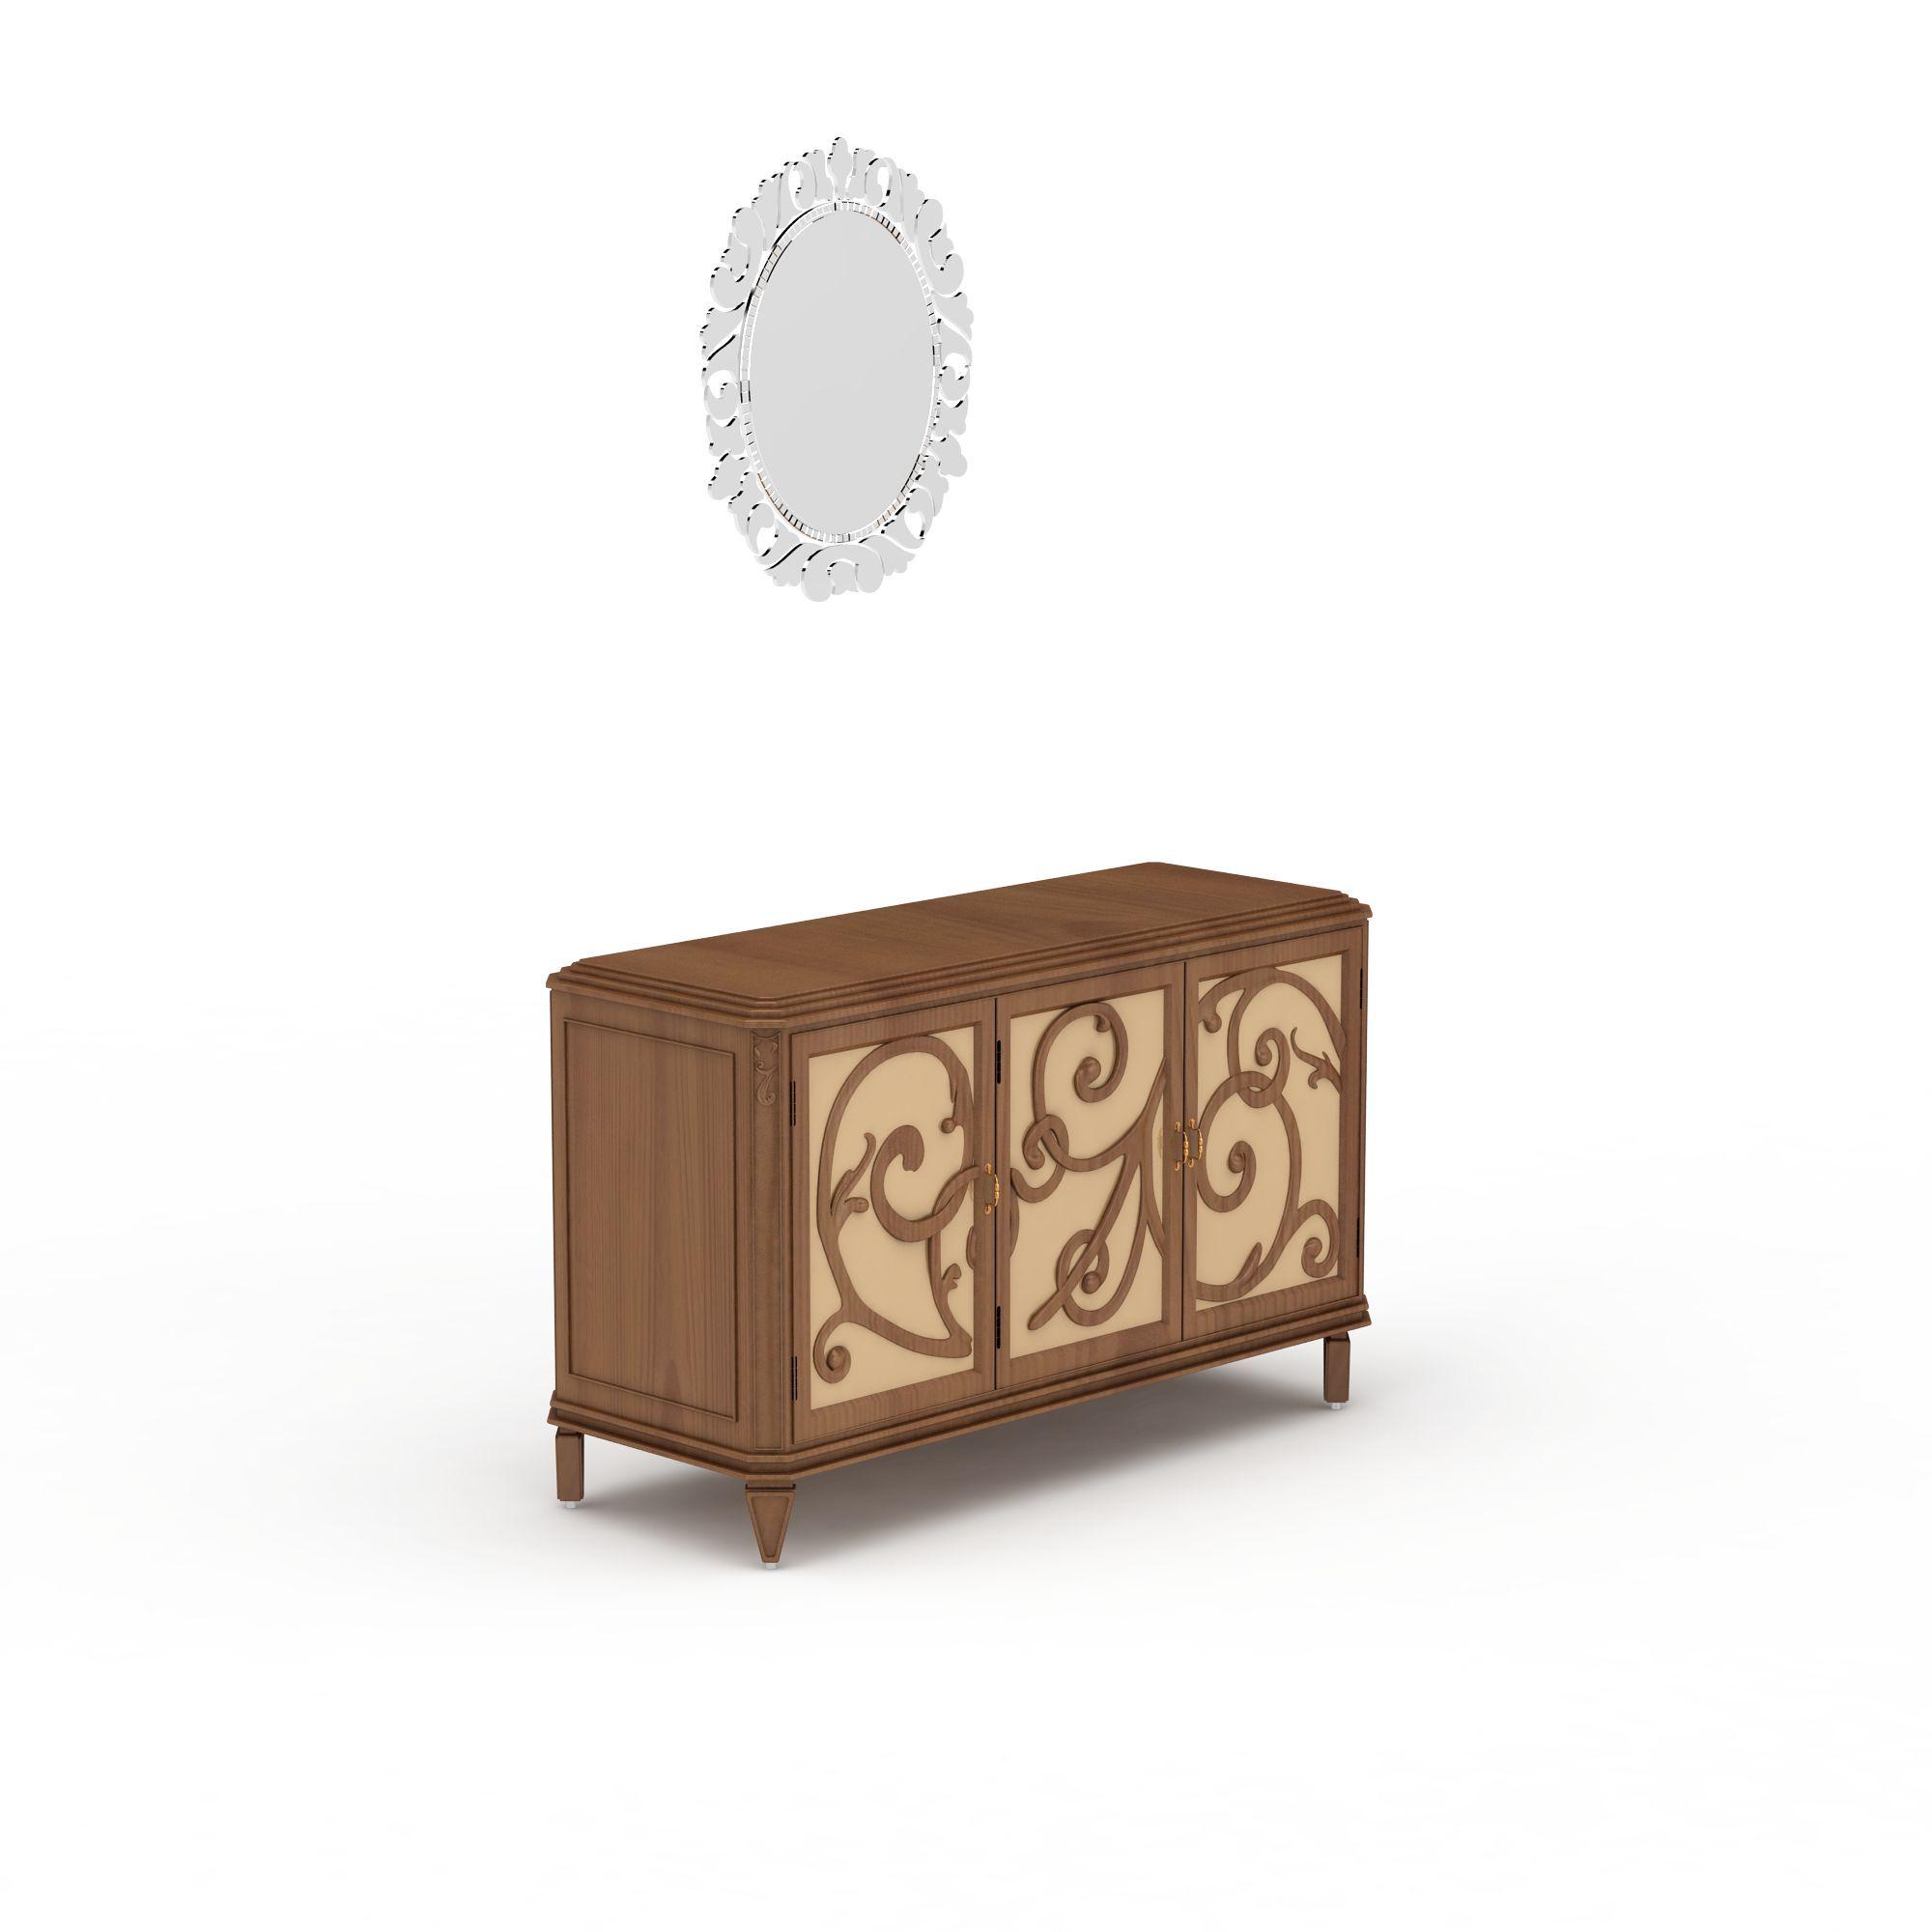 png 风格 现代 上传时间 2016/04/06  关键词:木质柜子3d模型中式柜图片